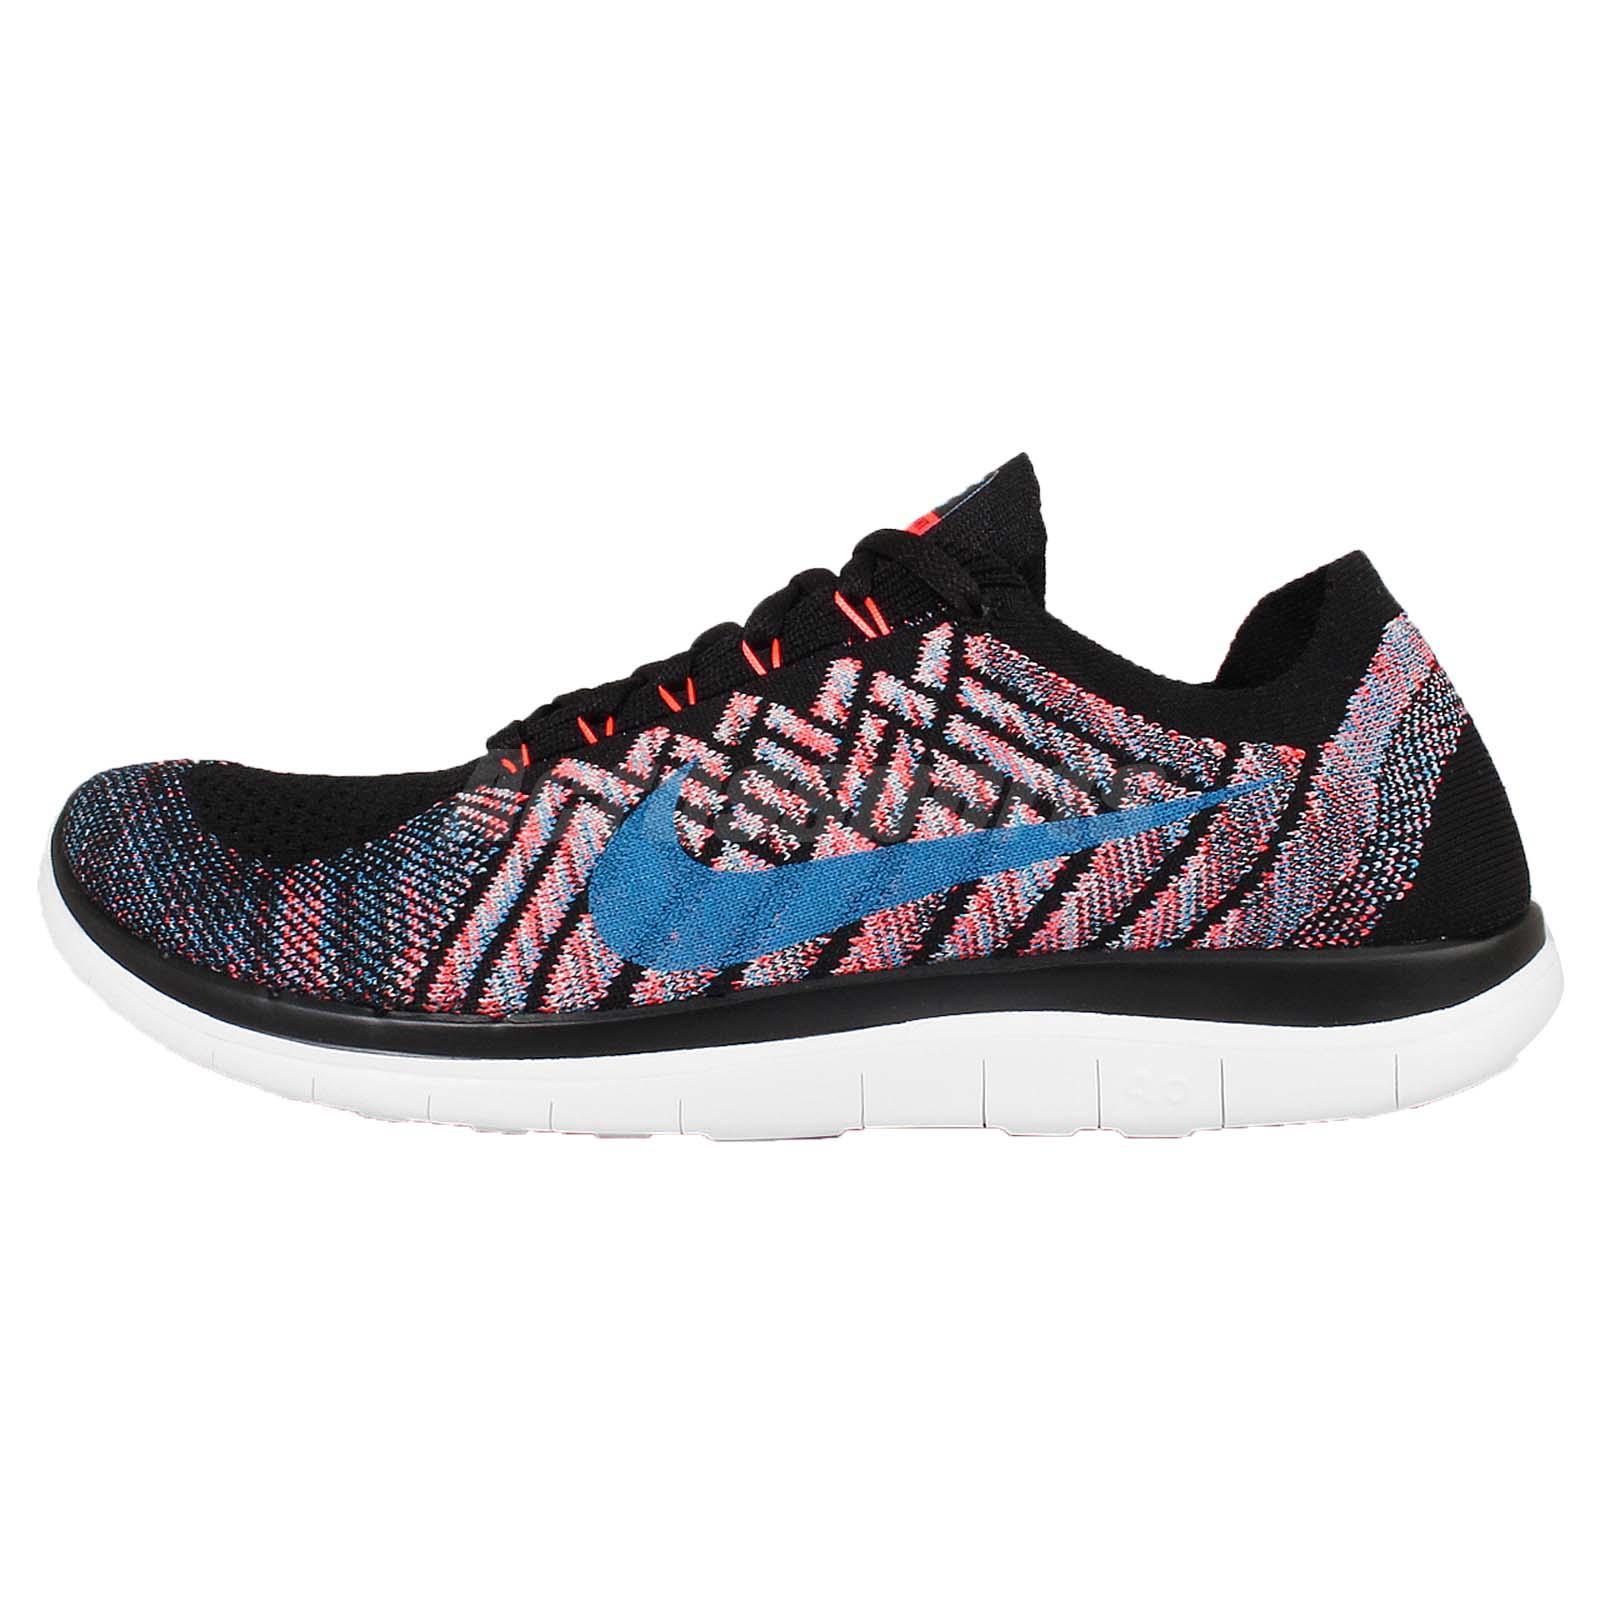 31f027417bdd ... Blue Lagoon Nike Free 4.0 Flyknit Black Hyper Orange Mens Running Shoes  Trainers 717075-009 ...